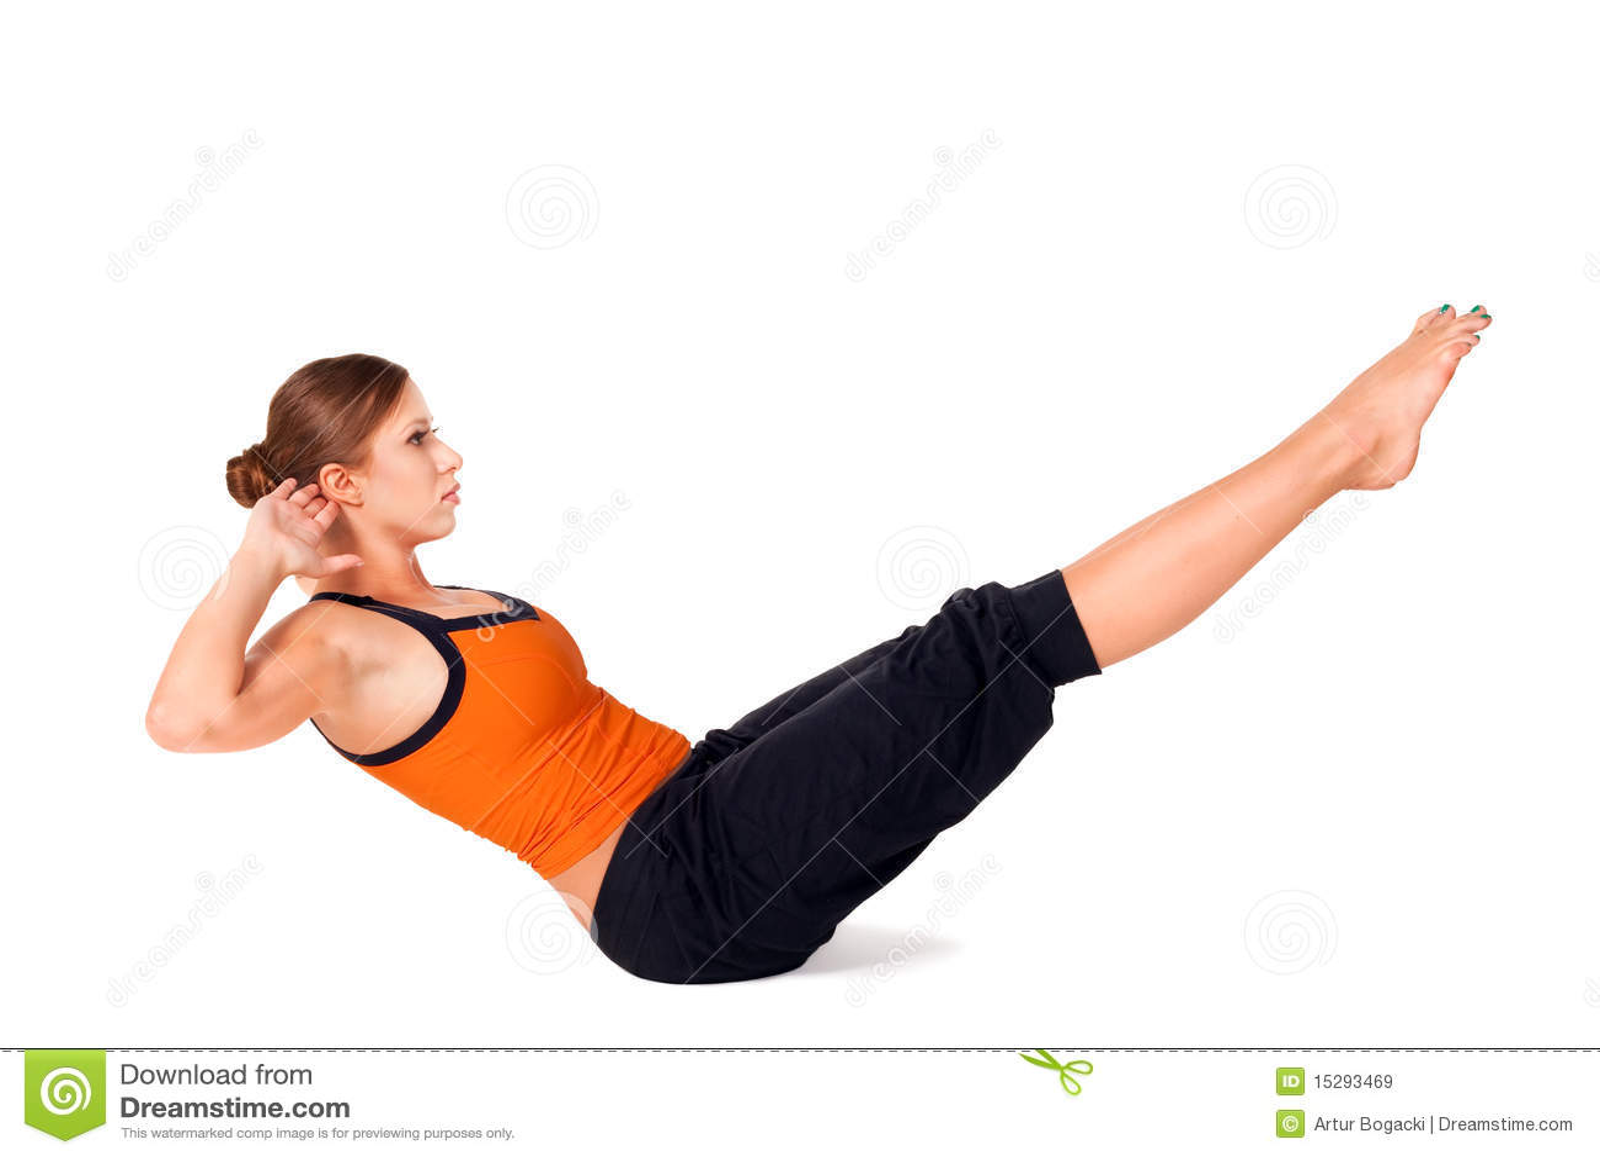 exercice de pratique de yoga de pose de bateau de femme image stock image du courbure pieds. Black Bedroom Furniture Sets. Home Design Ideas